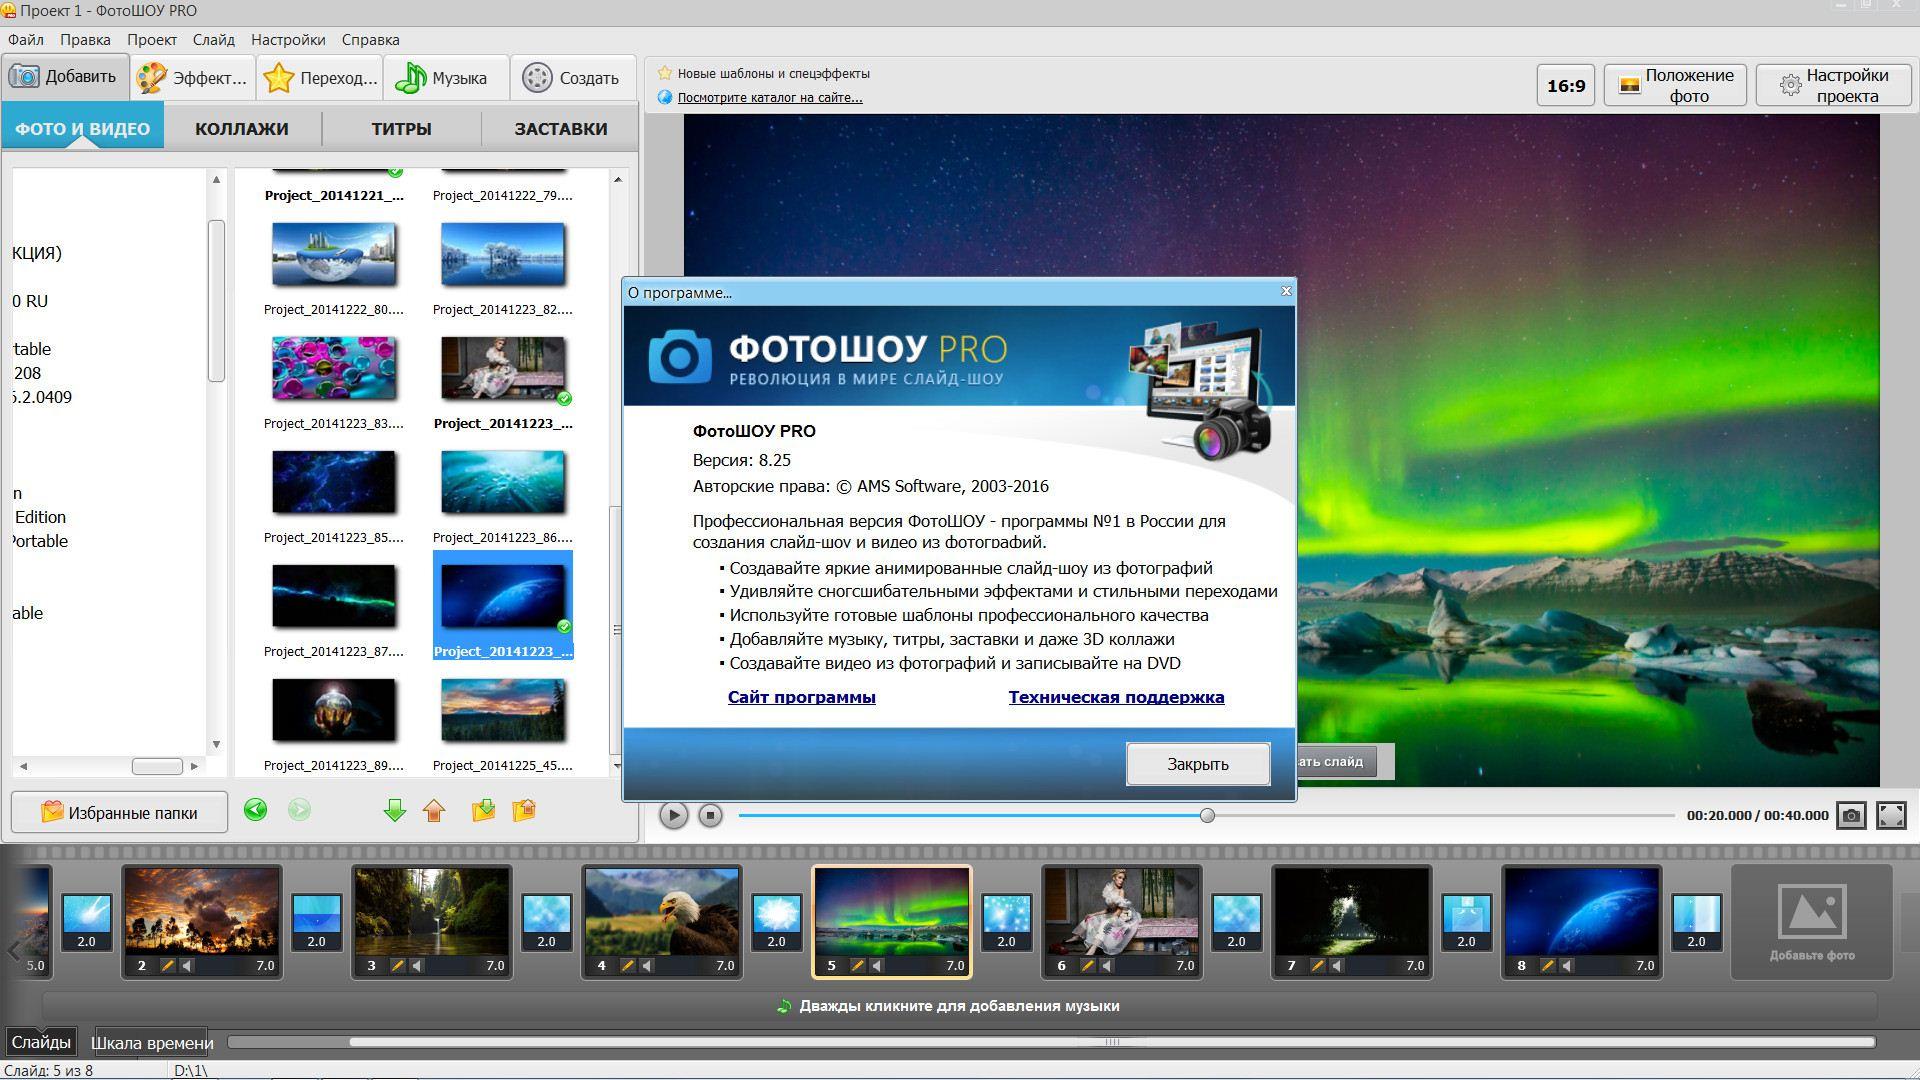 ФотоШОУ PRO 8.25 Repack by KaktusTV (2016) Русский